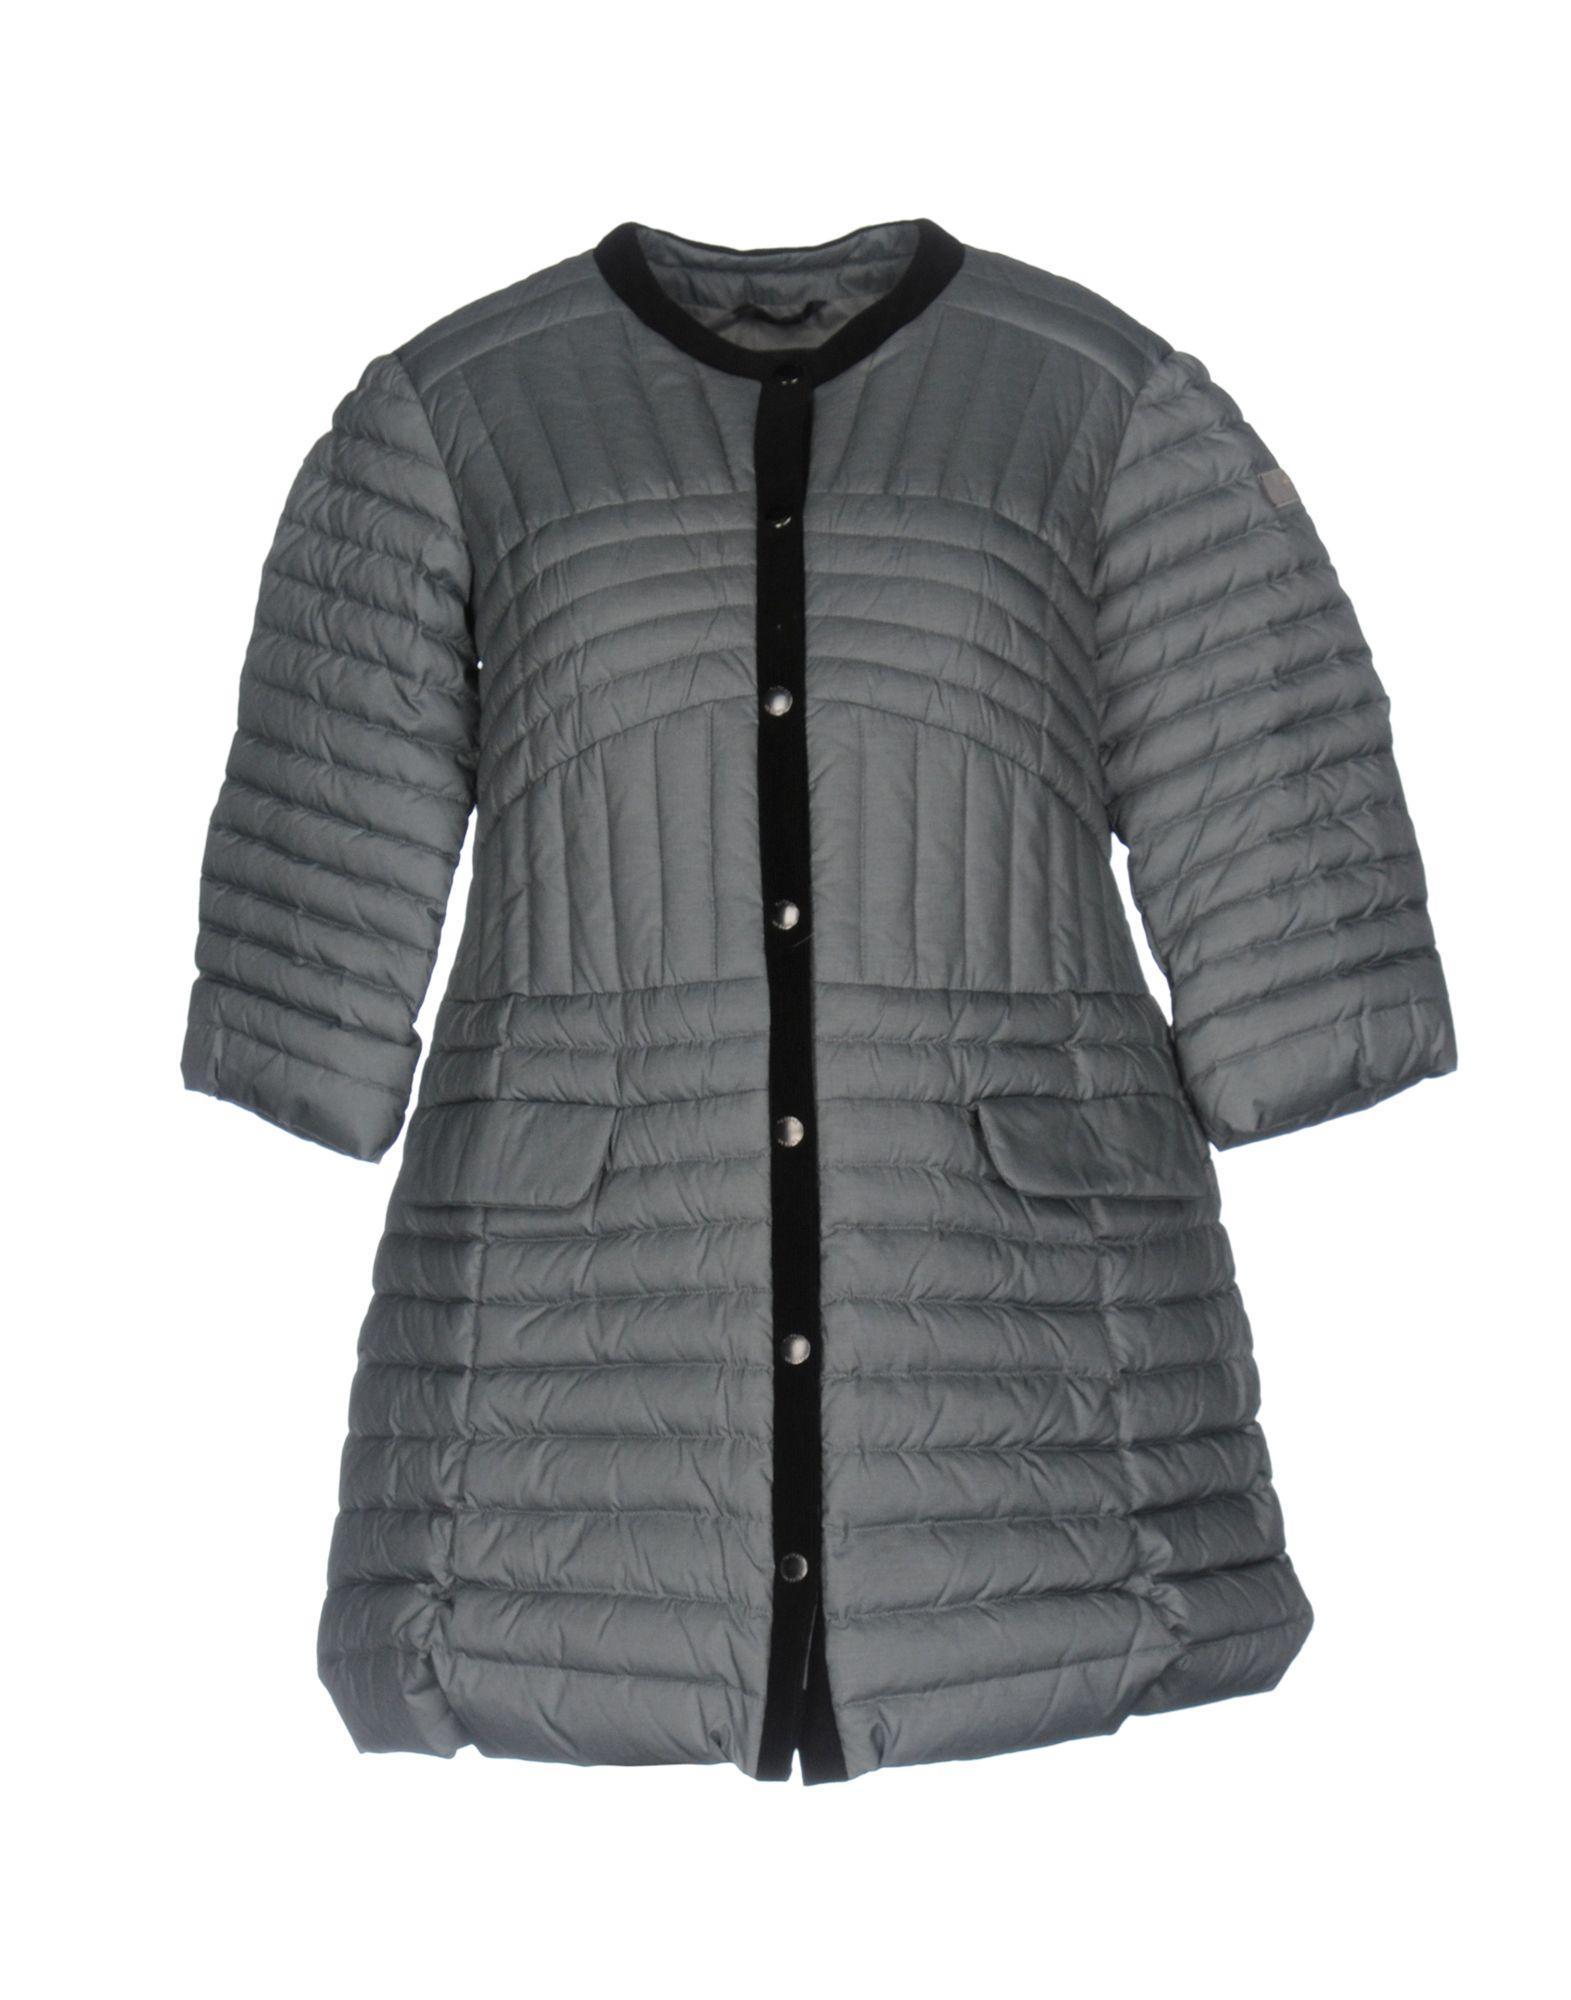 Tatras Down Jacket In Grey